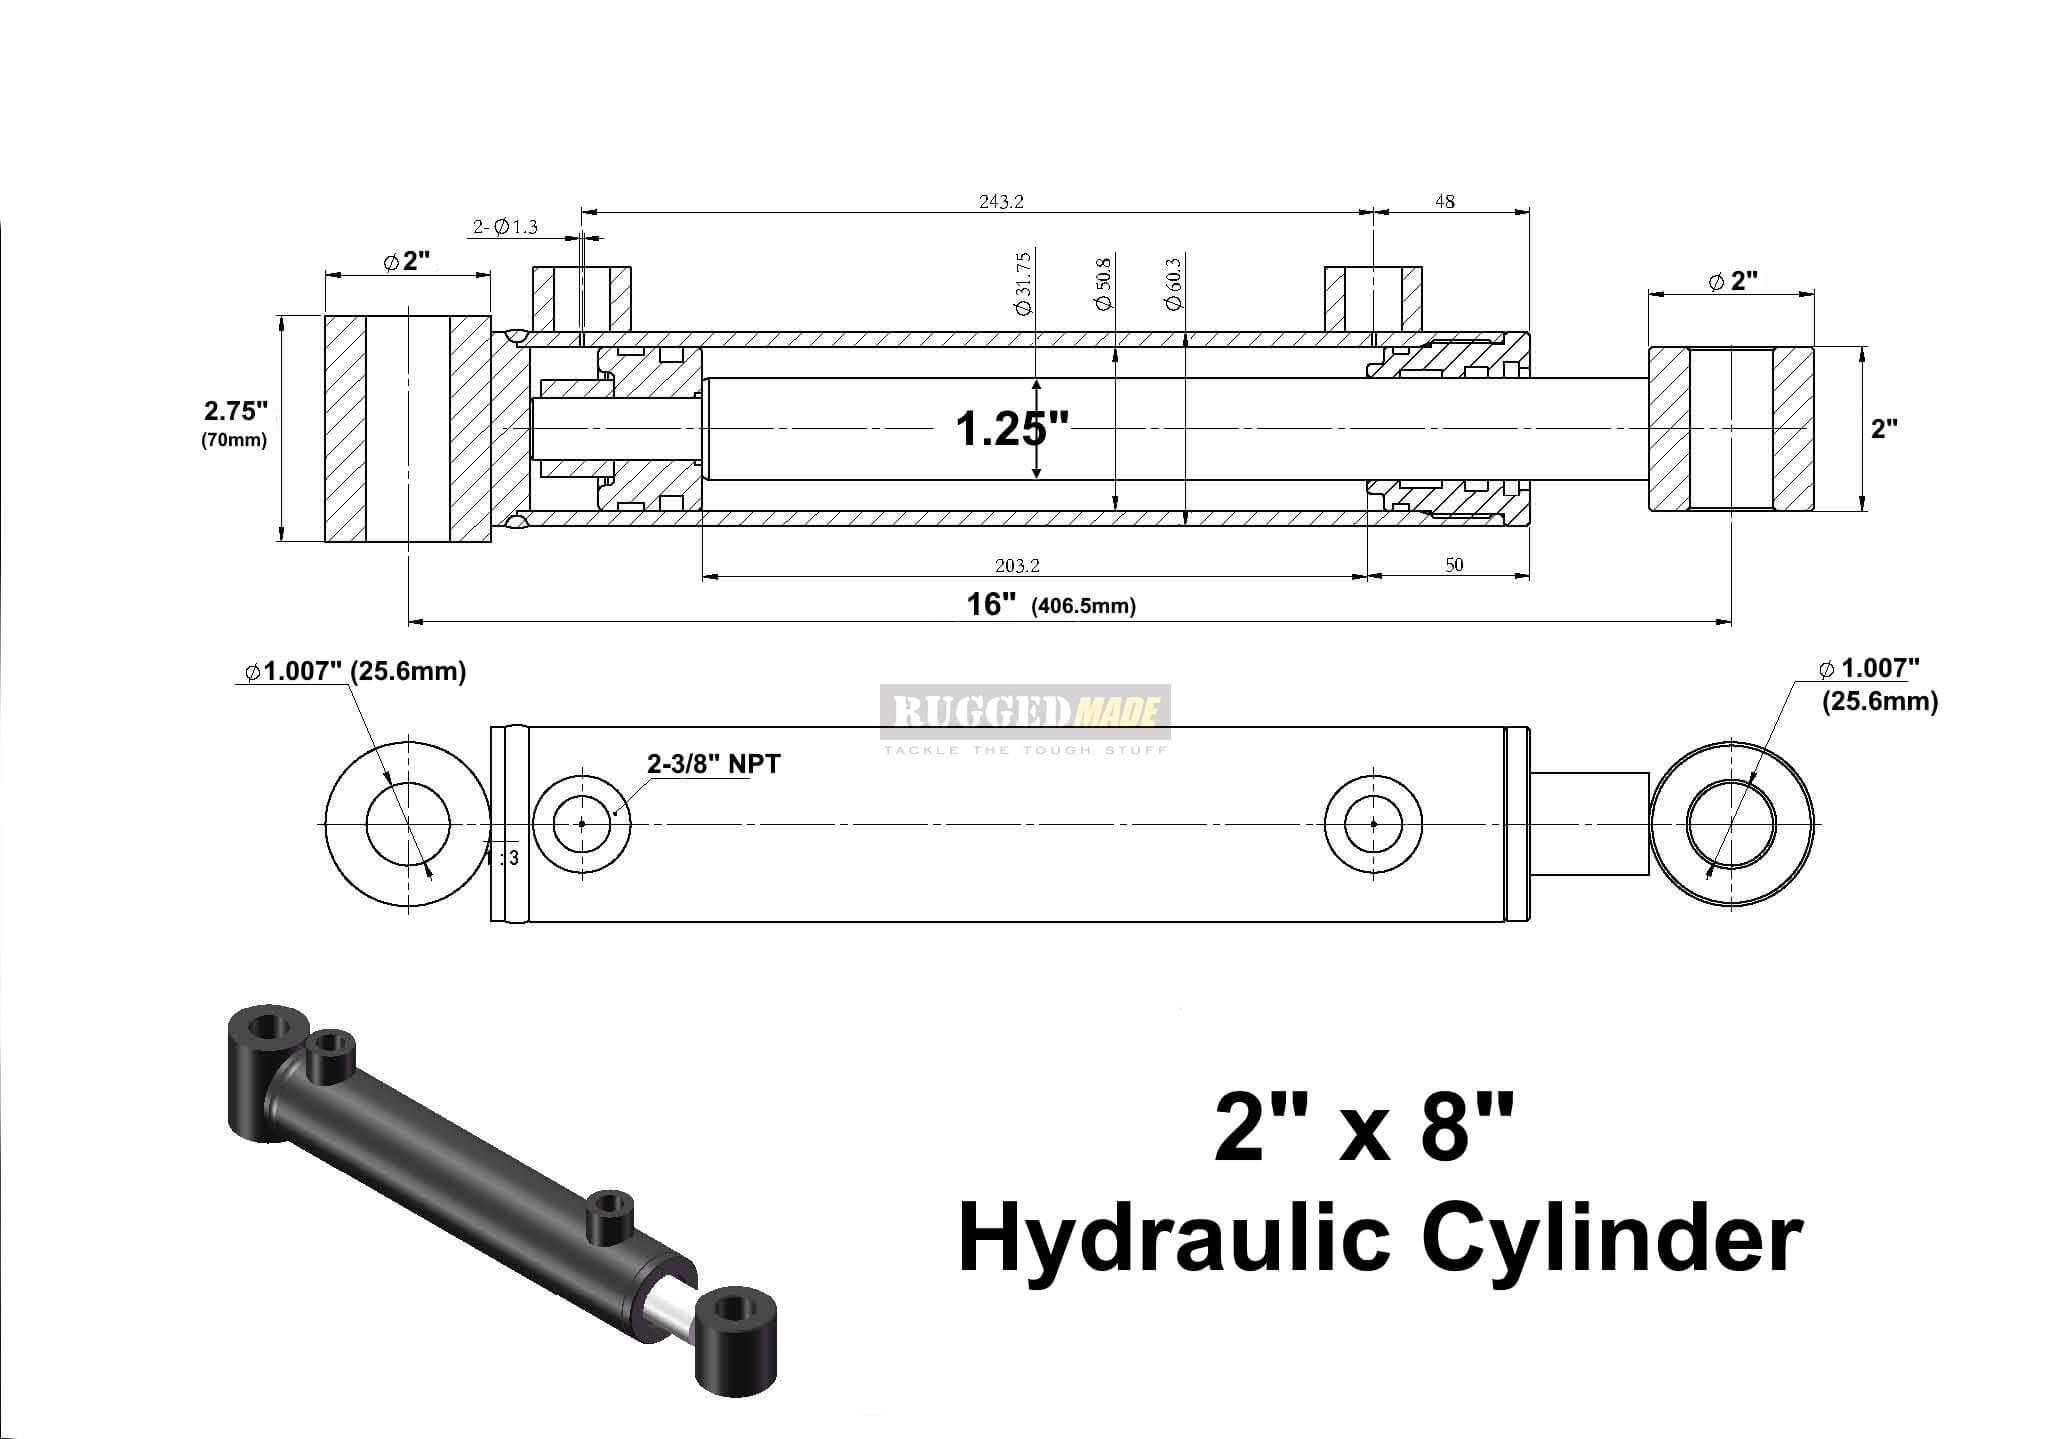 "8 Cylinder Engine Diagram Welded Log Lift Cylinder 3 8"" Work Ports 2"" Id X 8"" Stroke X 1 25 Of 8 Cylinder Engine Diagram"